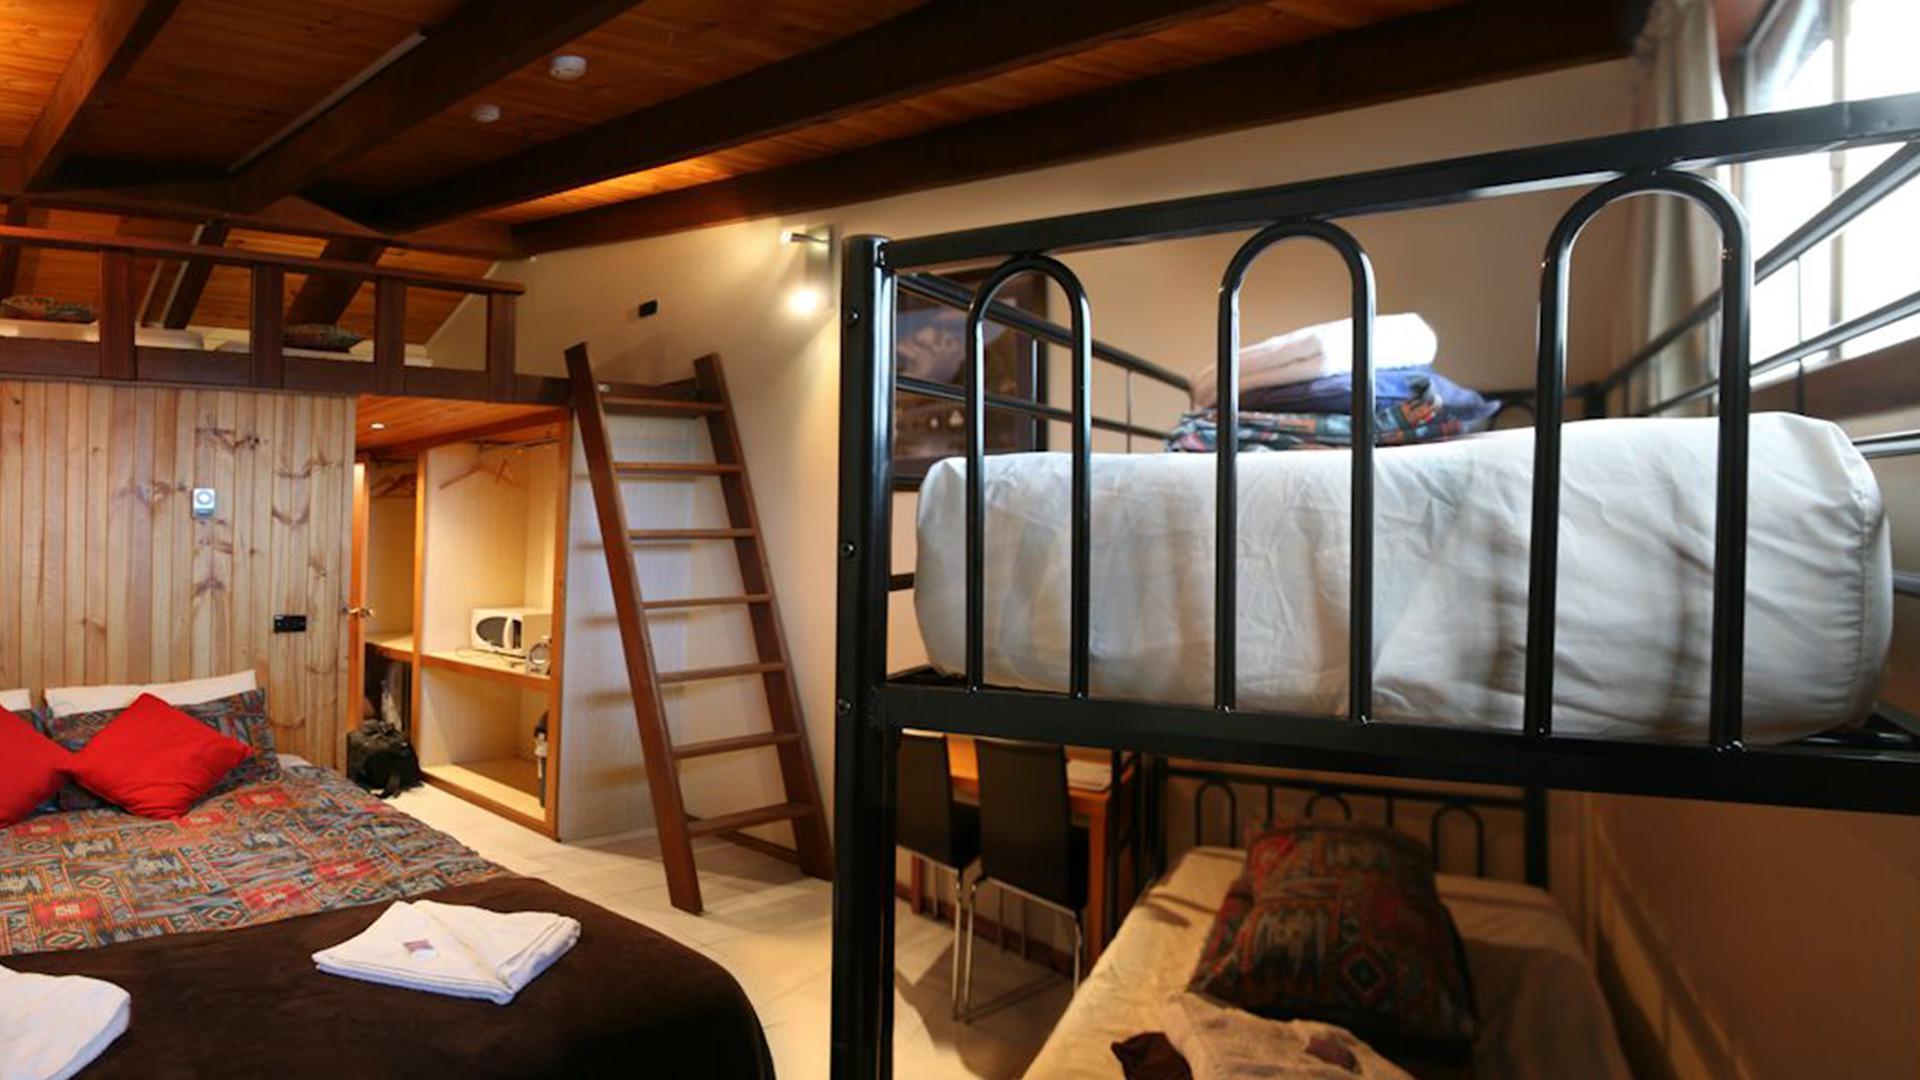 Mezzanine Room image 1 at Alpine Retreat Mt Buller by Mount Buller Alpine Resort (Unincorporated), Victoria, Australia